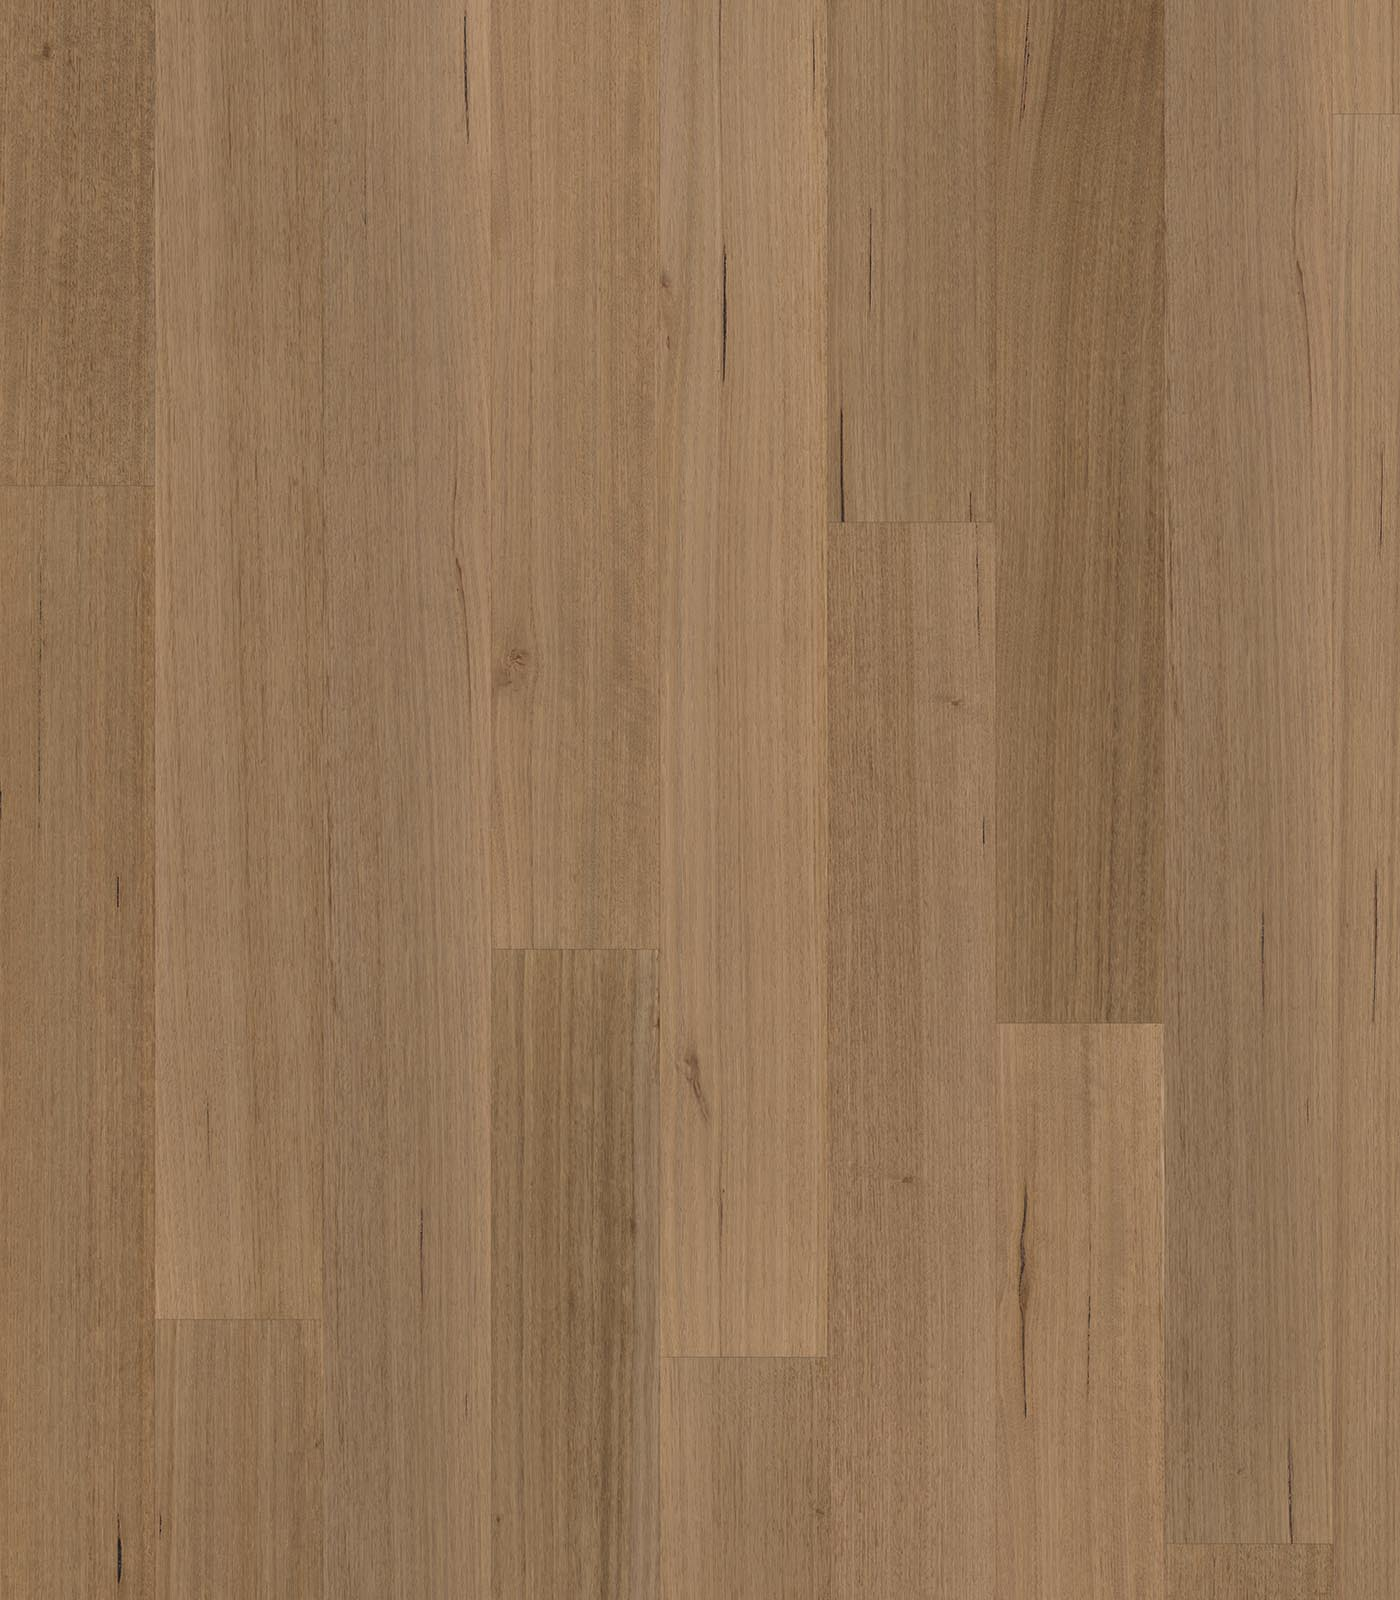 Albany-Tasmanian oak Floors-After Oak Collection-flat